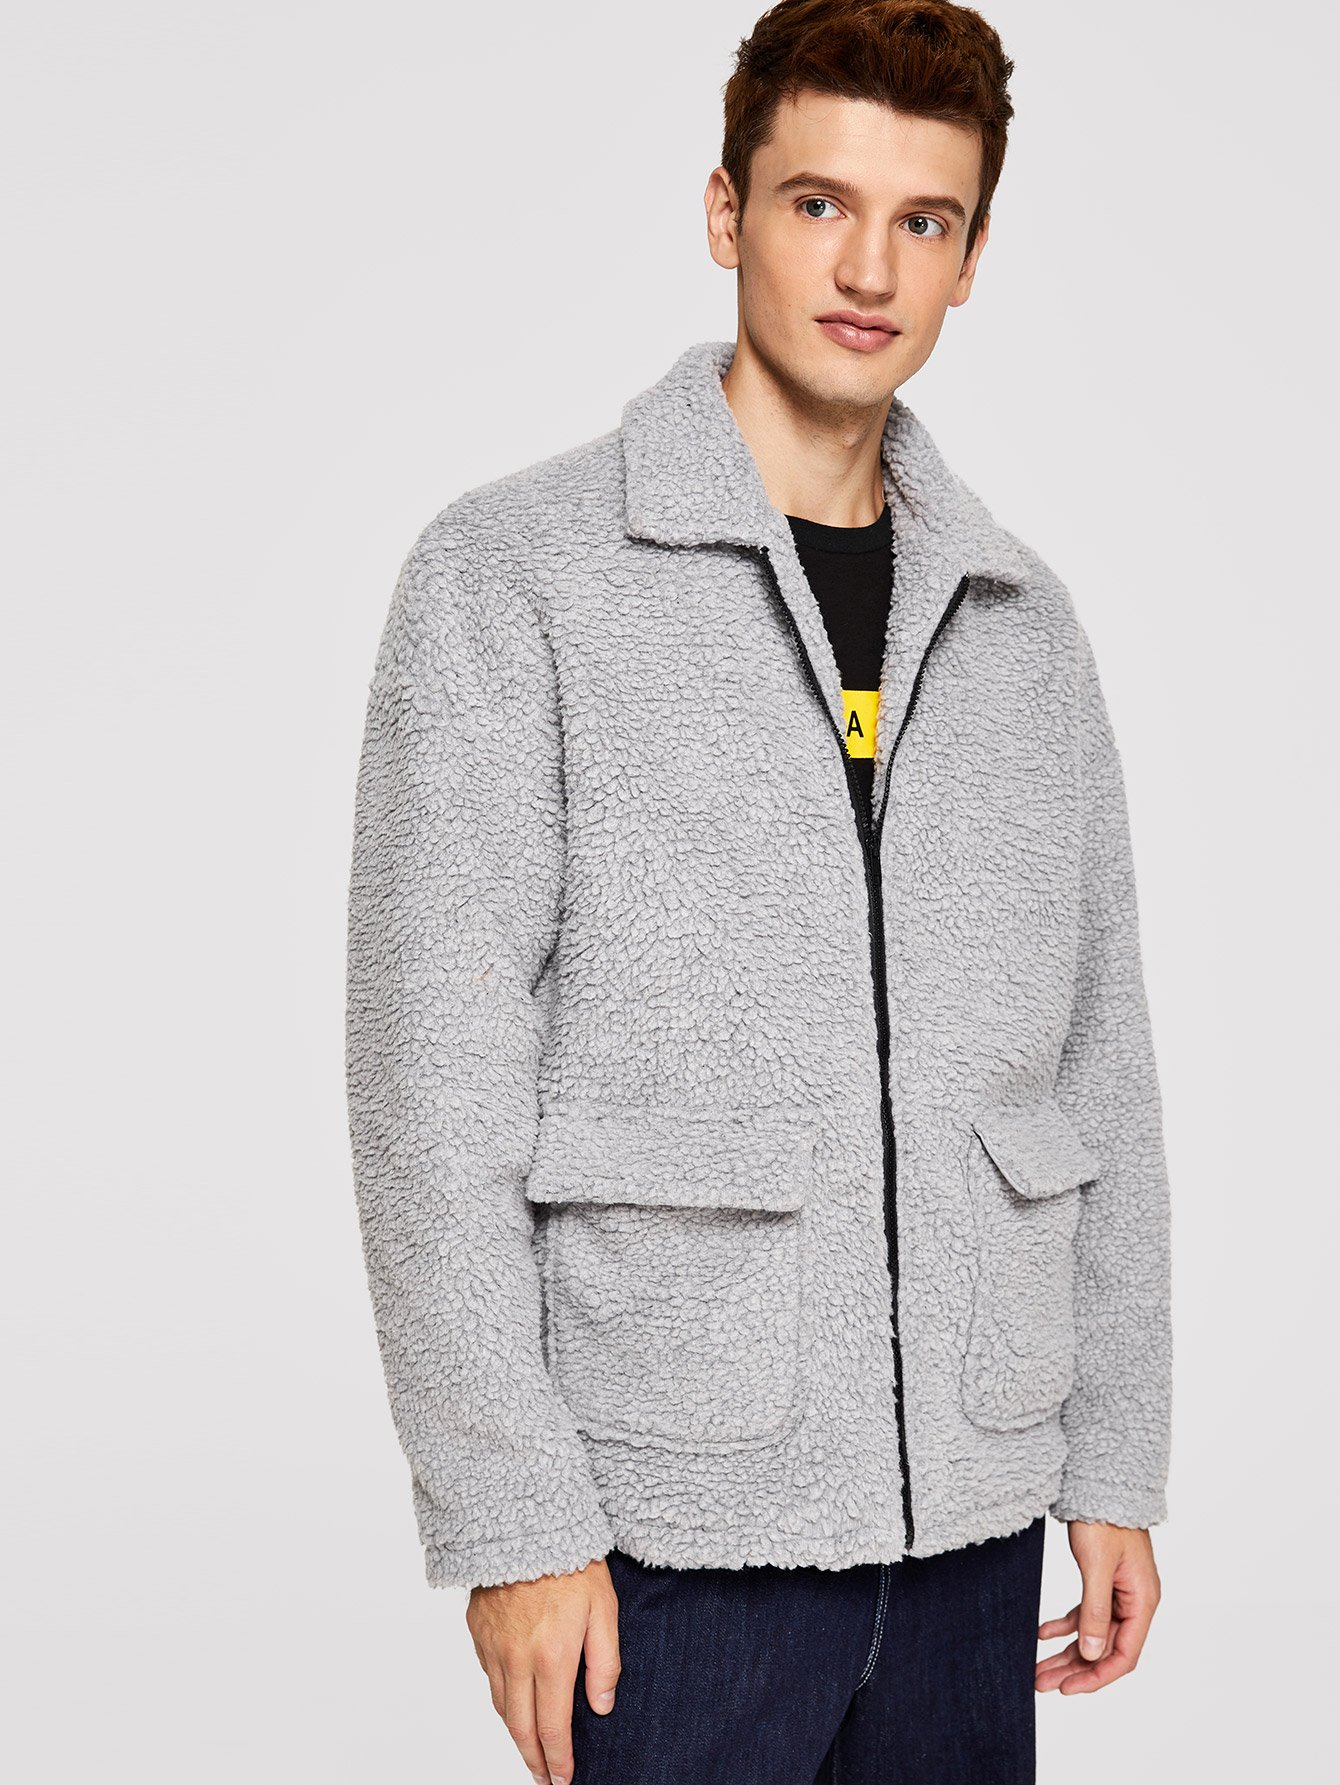 Купить Для мужчин тедди куртка на молнии с карманом, Oleg, SheIn